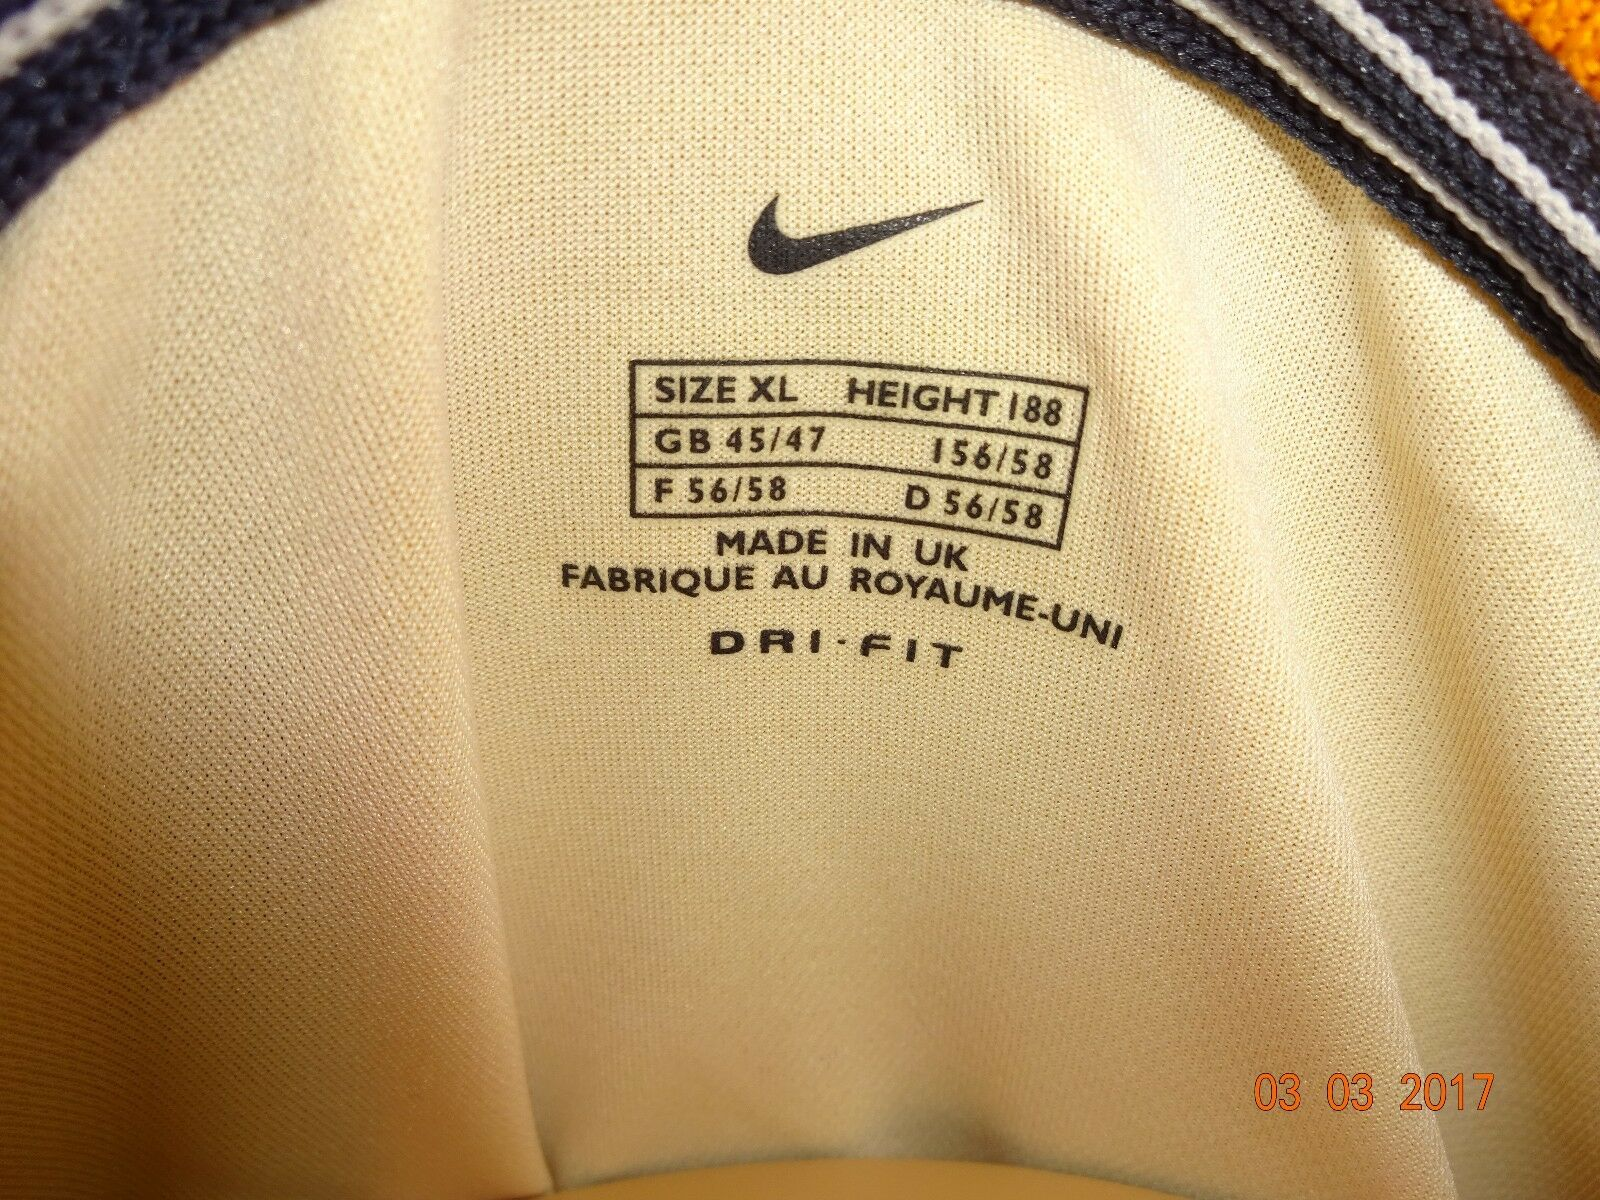 Hertha BSC Berlin Nike Nike Nike Langarm Ausweich Spieler Trikot 00 01  o.tel.o Gr.XL Neu 9624aa